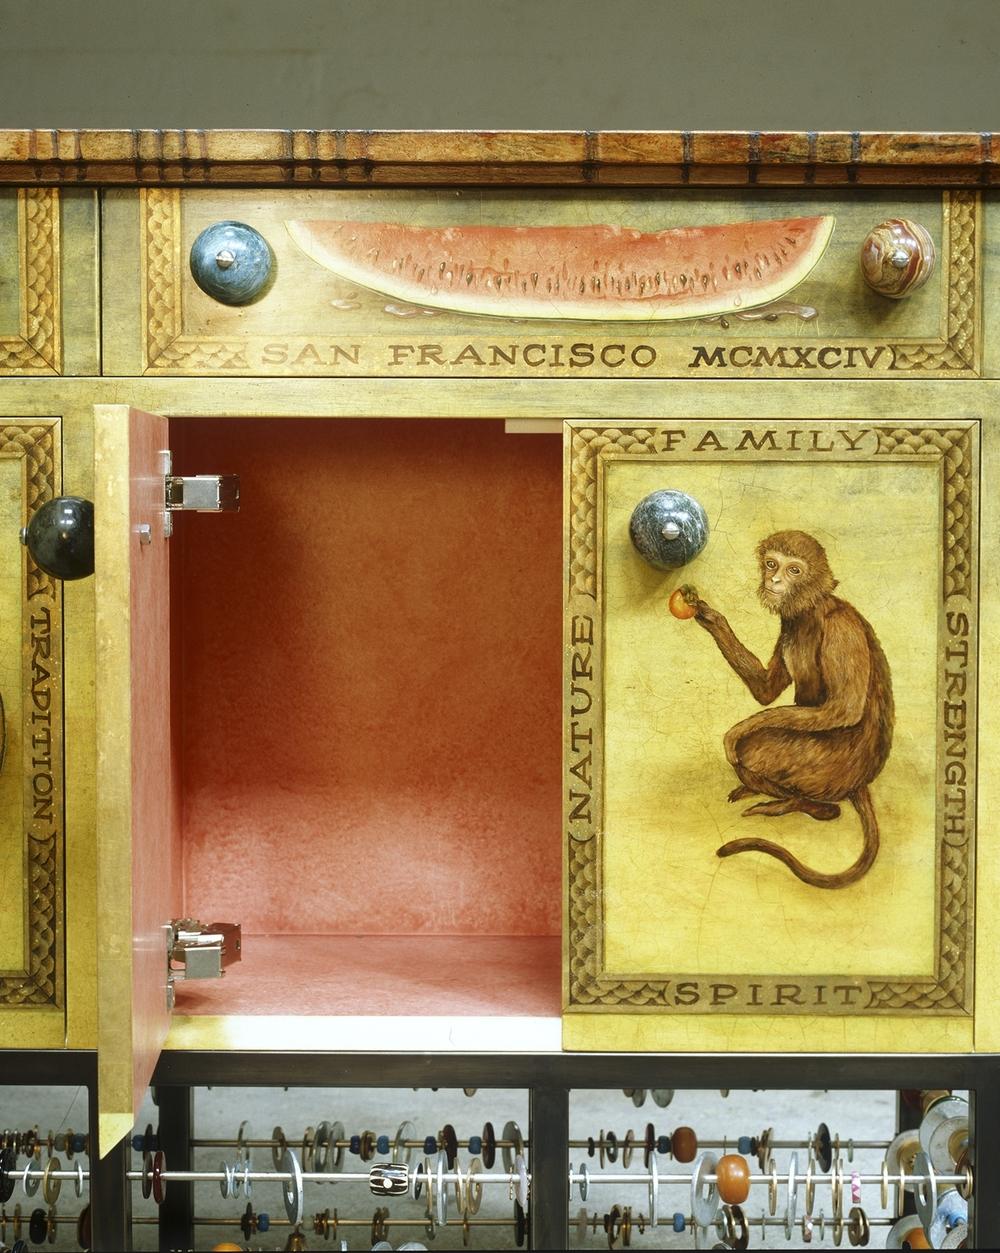 de'Medici Sideboard interior-OAKLAND MUSEUM.jpg